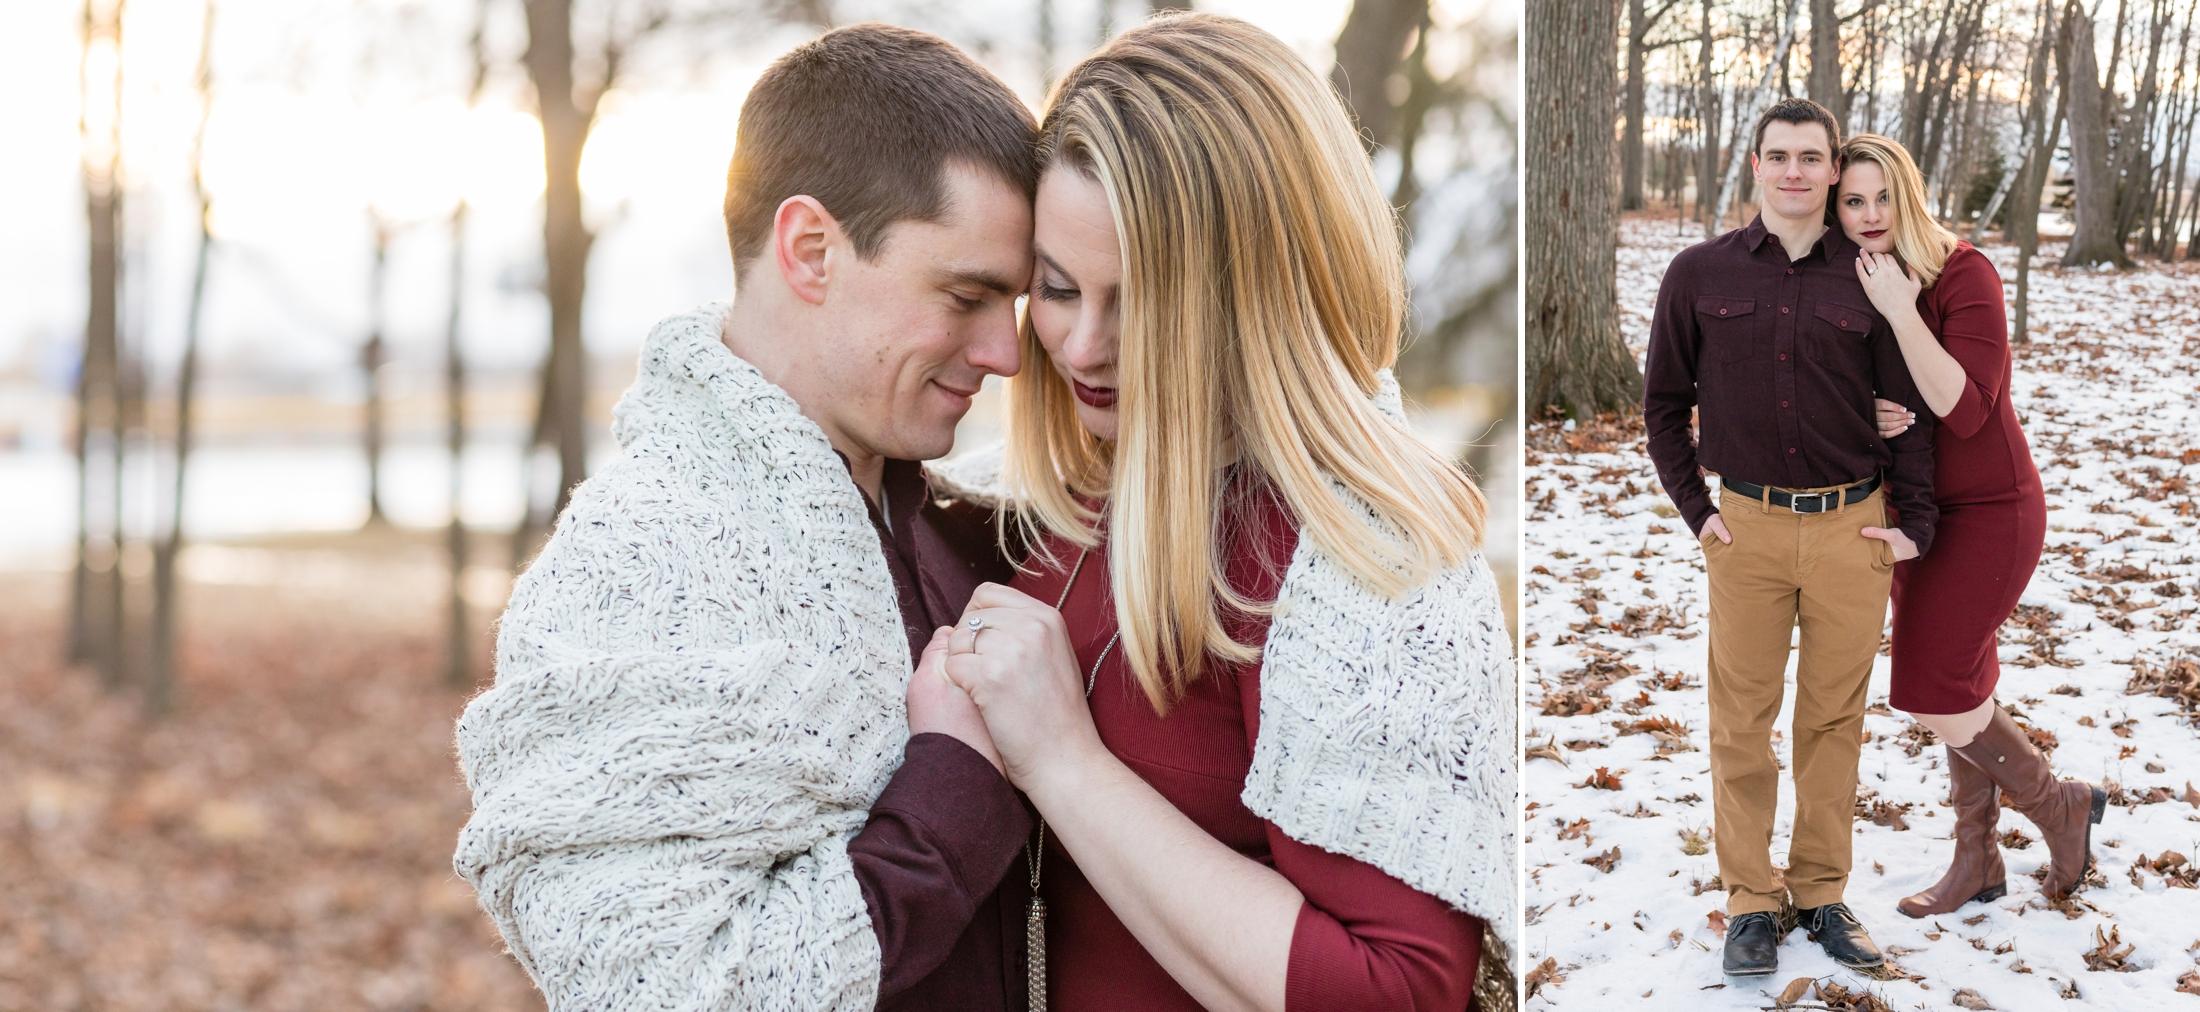 Wisconsin Winter Engagement Session,  Green Isle Park | KLEM Studios, Wedding + Boudoir Photographer